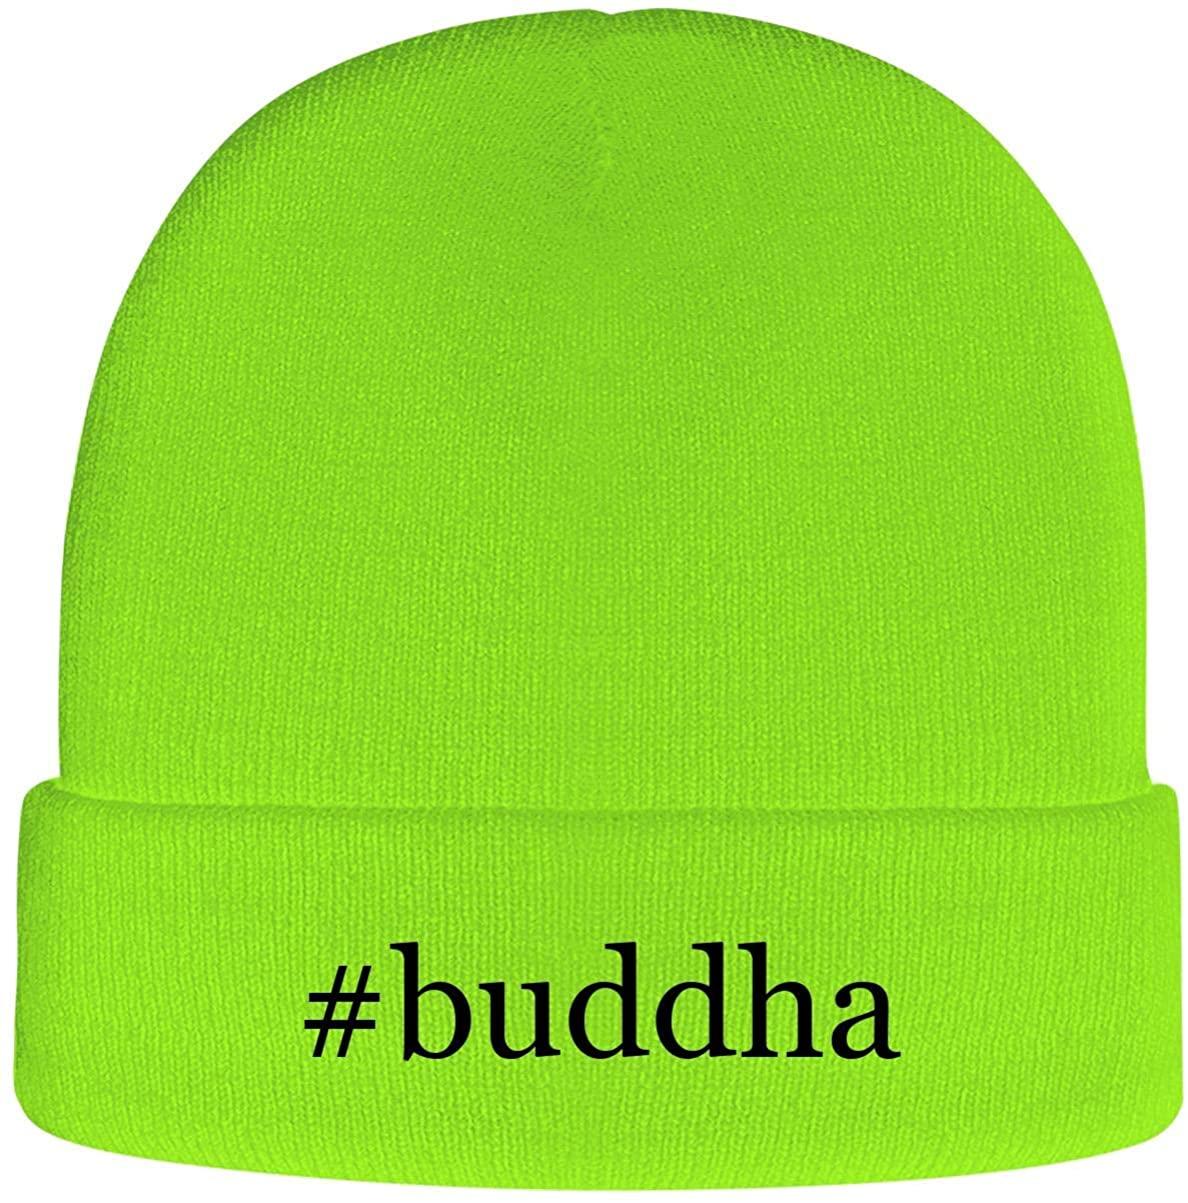 One Legging it Around #Buddha - Hashtag Soft Adult Beanie Cap